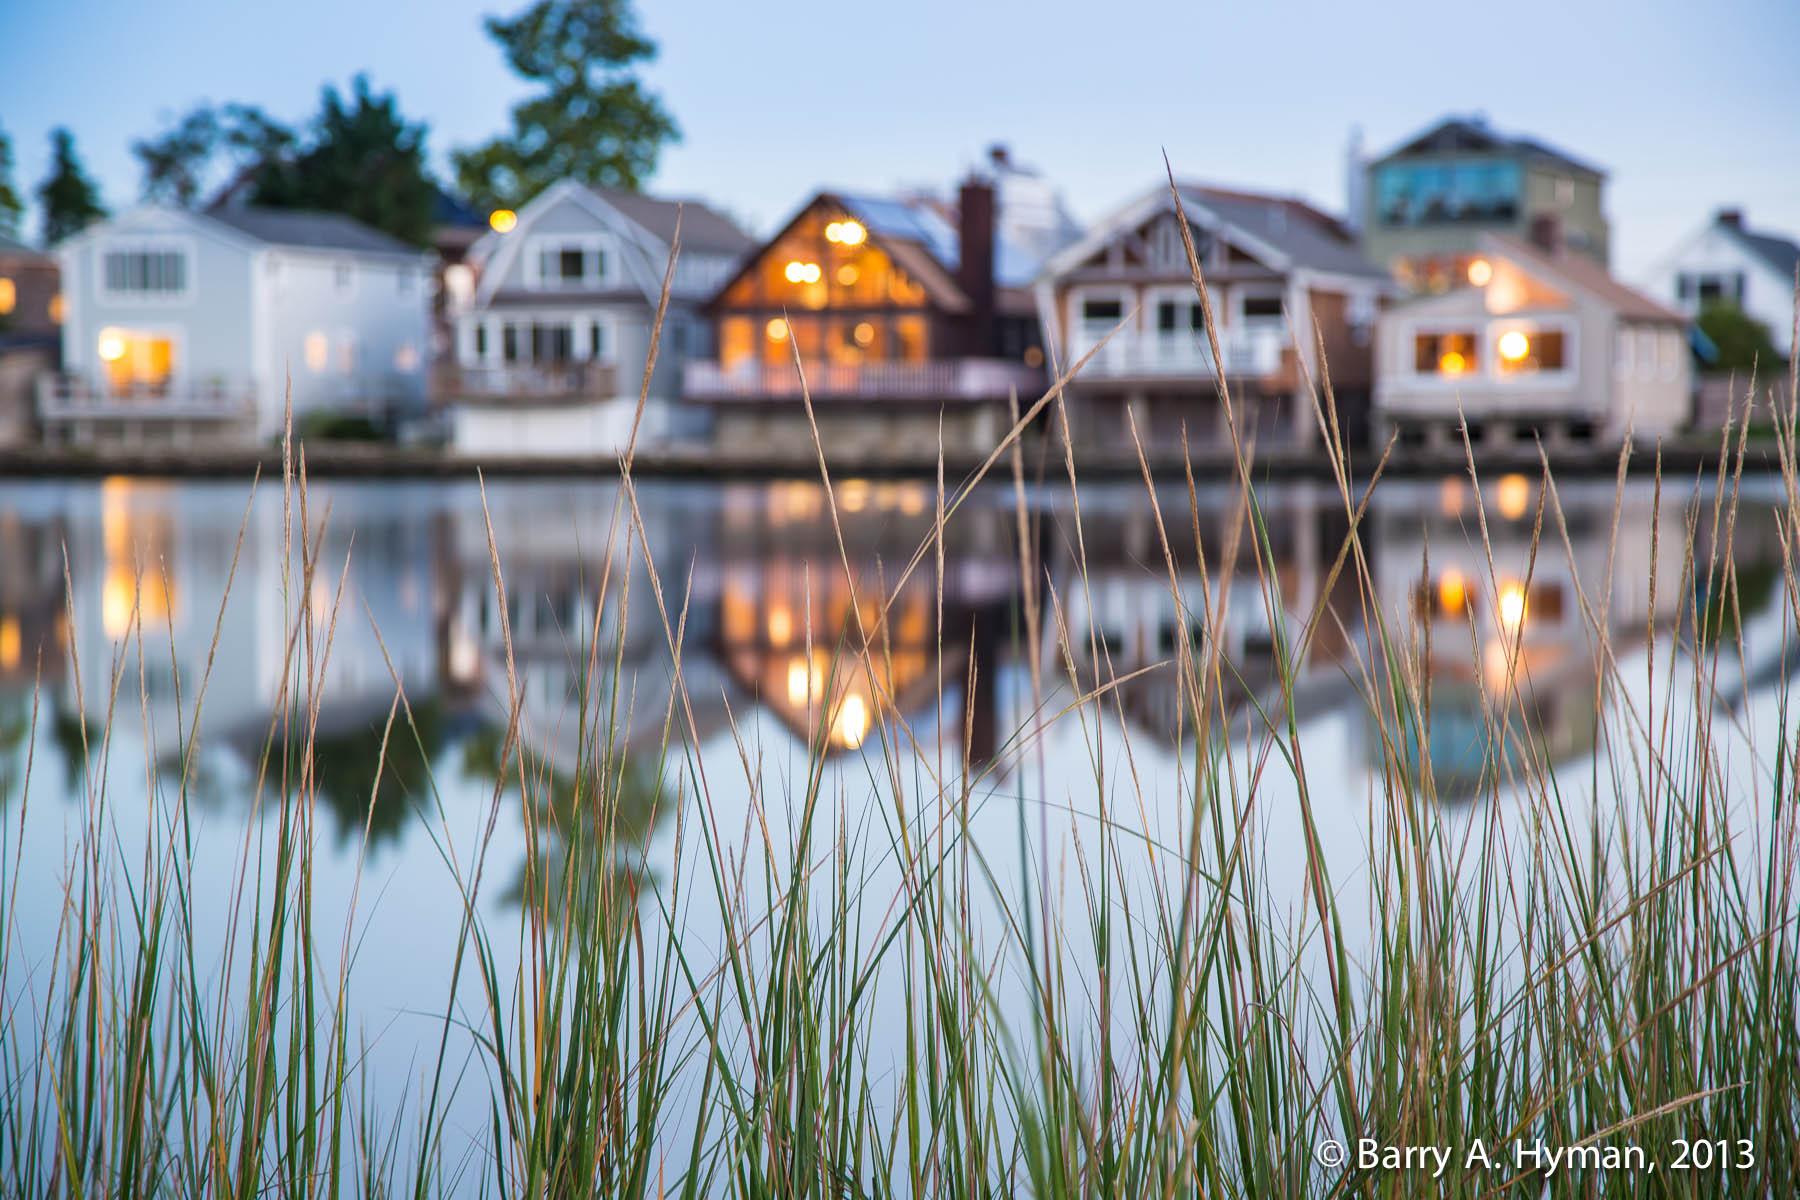 Barry A Hyman Mill Pond Reflections copyright.jpg